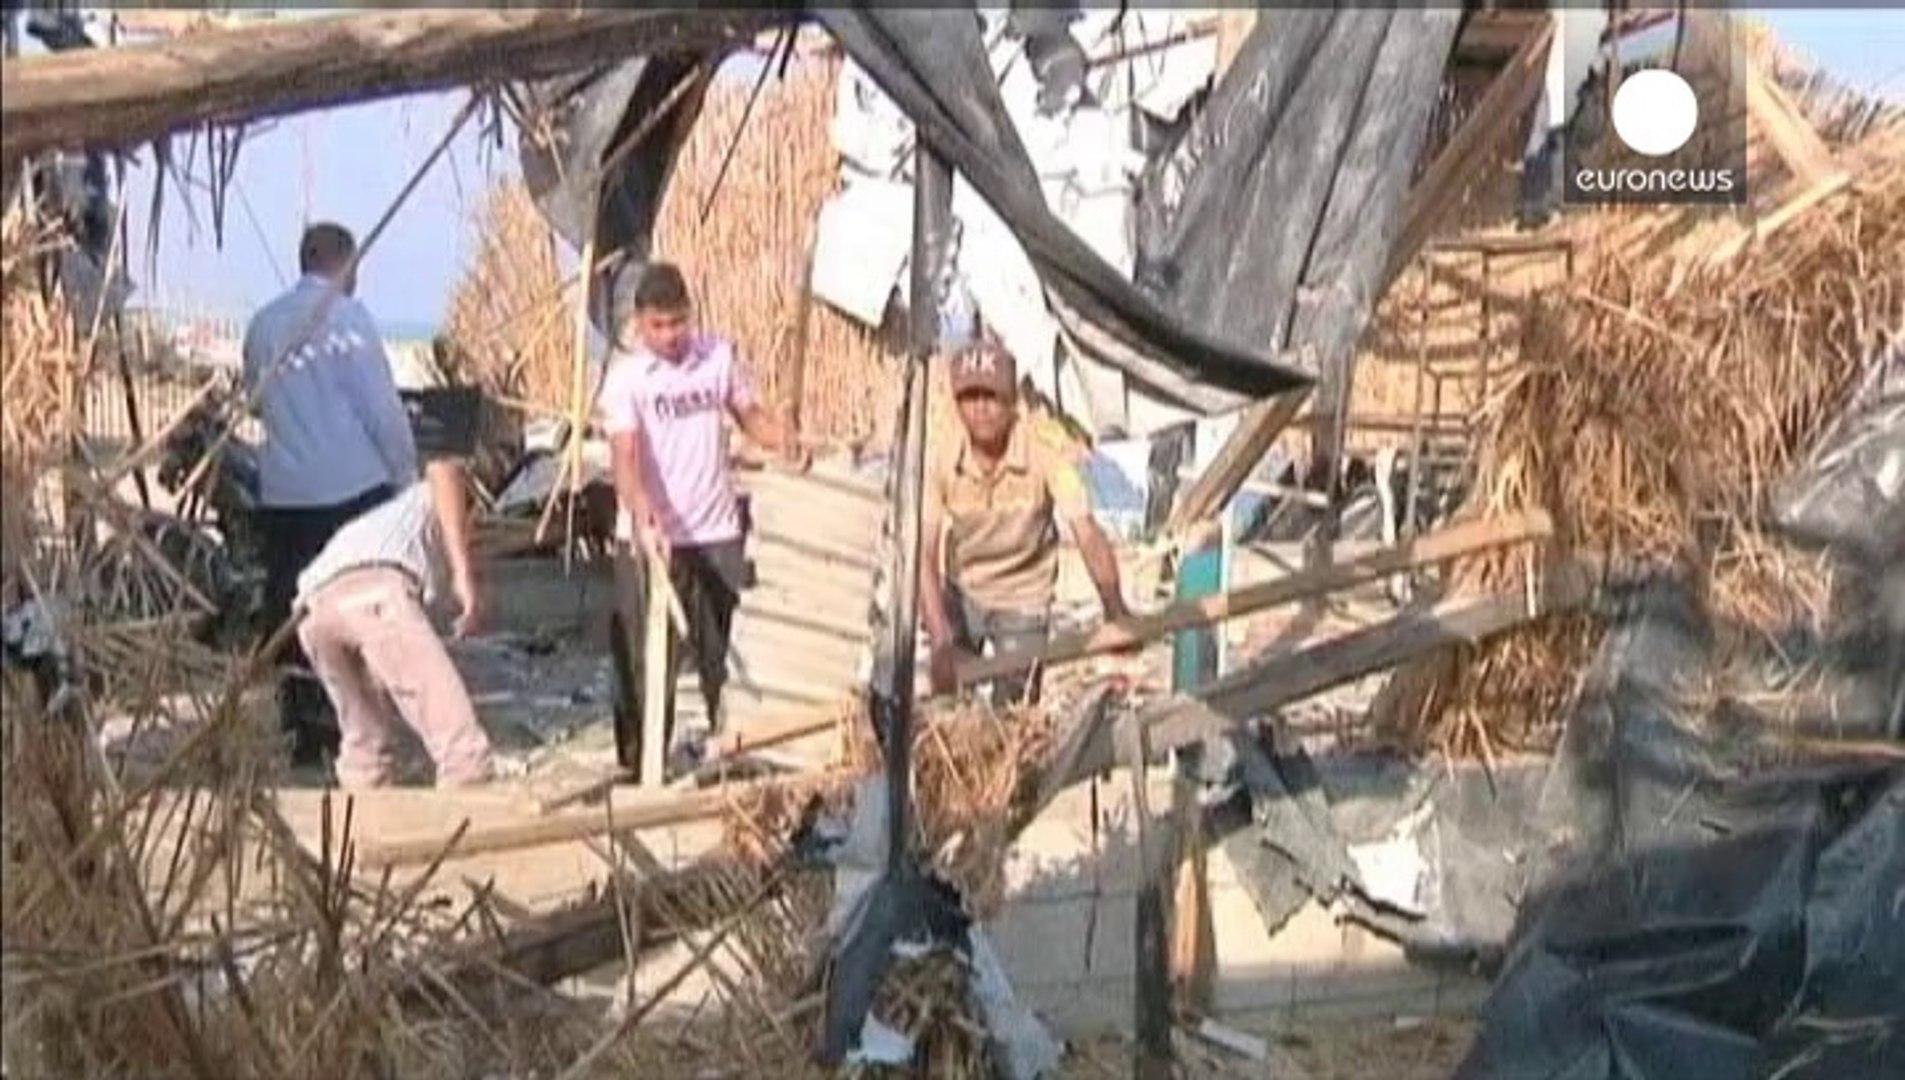 Israel stages air strikes on Gaza